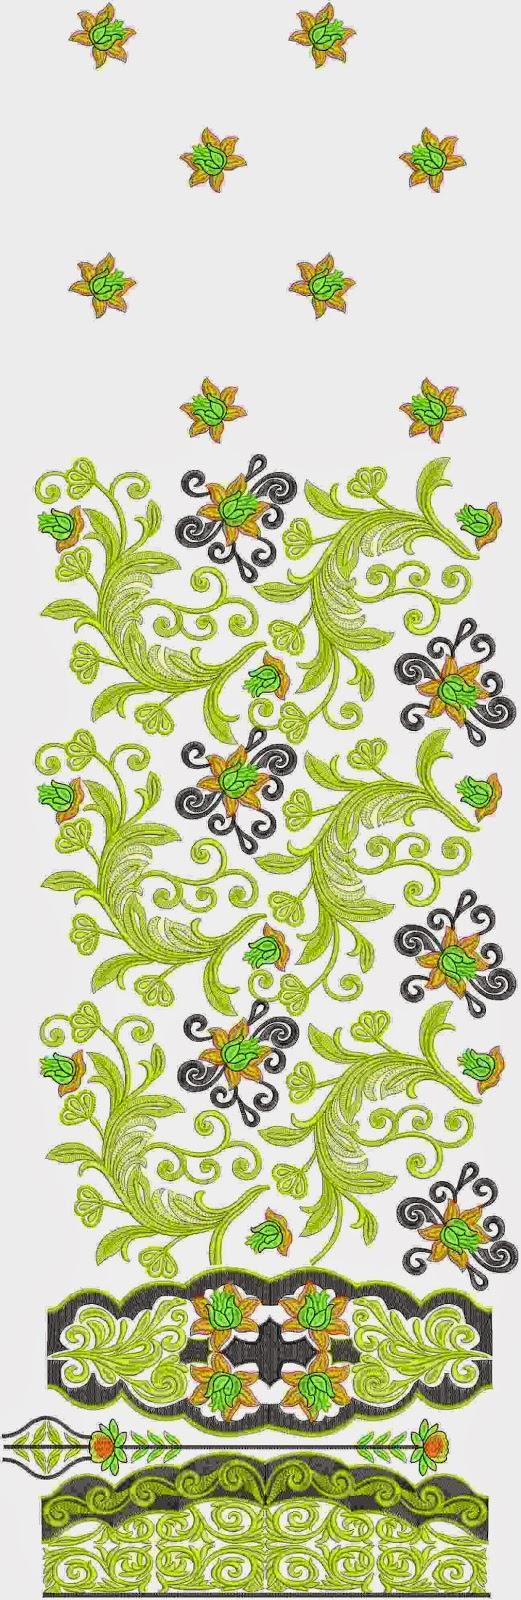 vry hand groot quilt borduurwerk Lawn pak klere